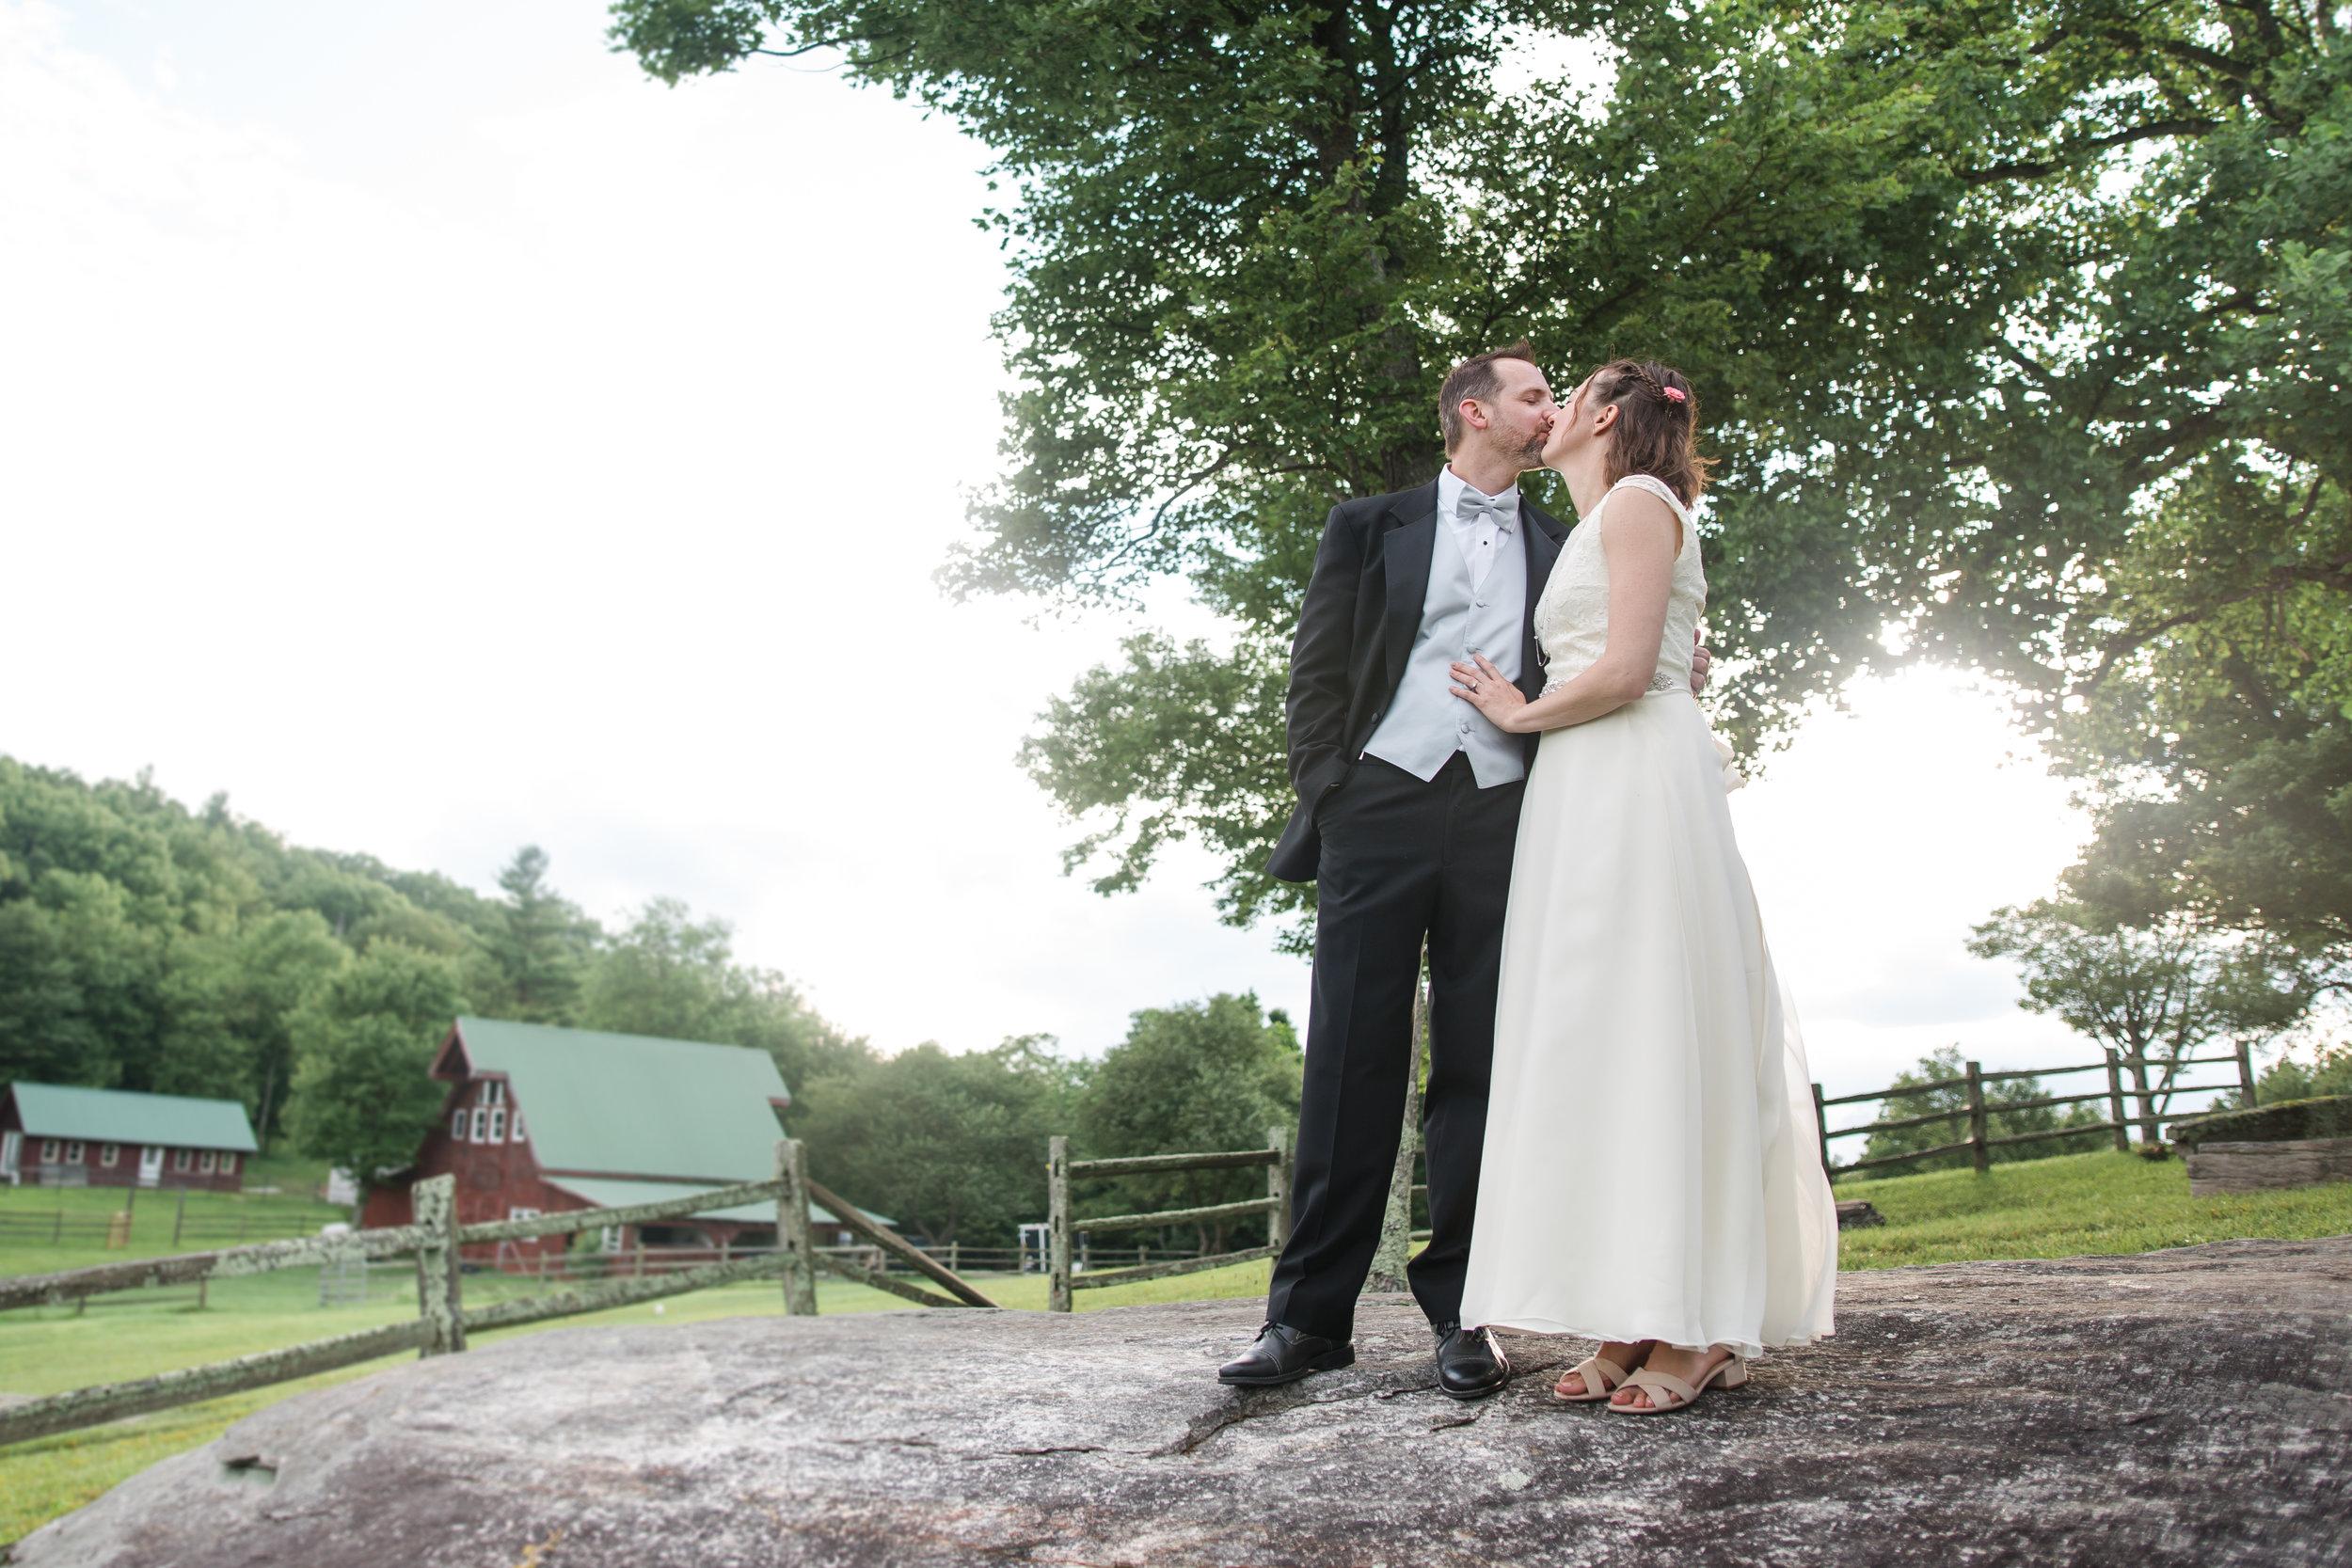 aubrey-joshua-wedding-358.jpg